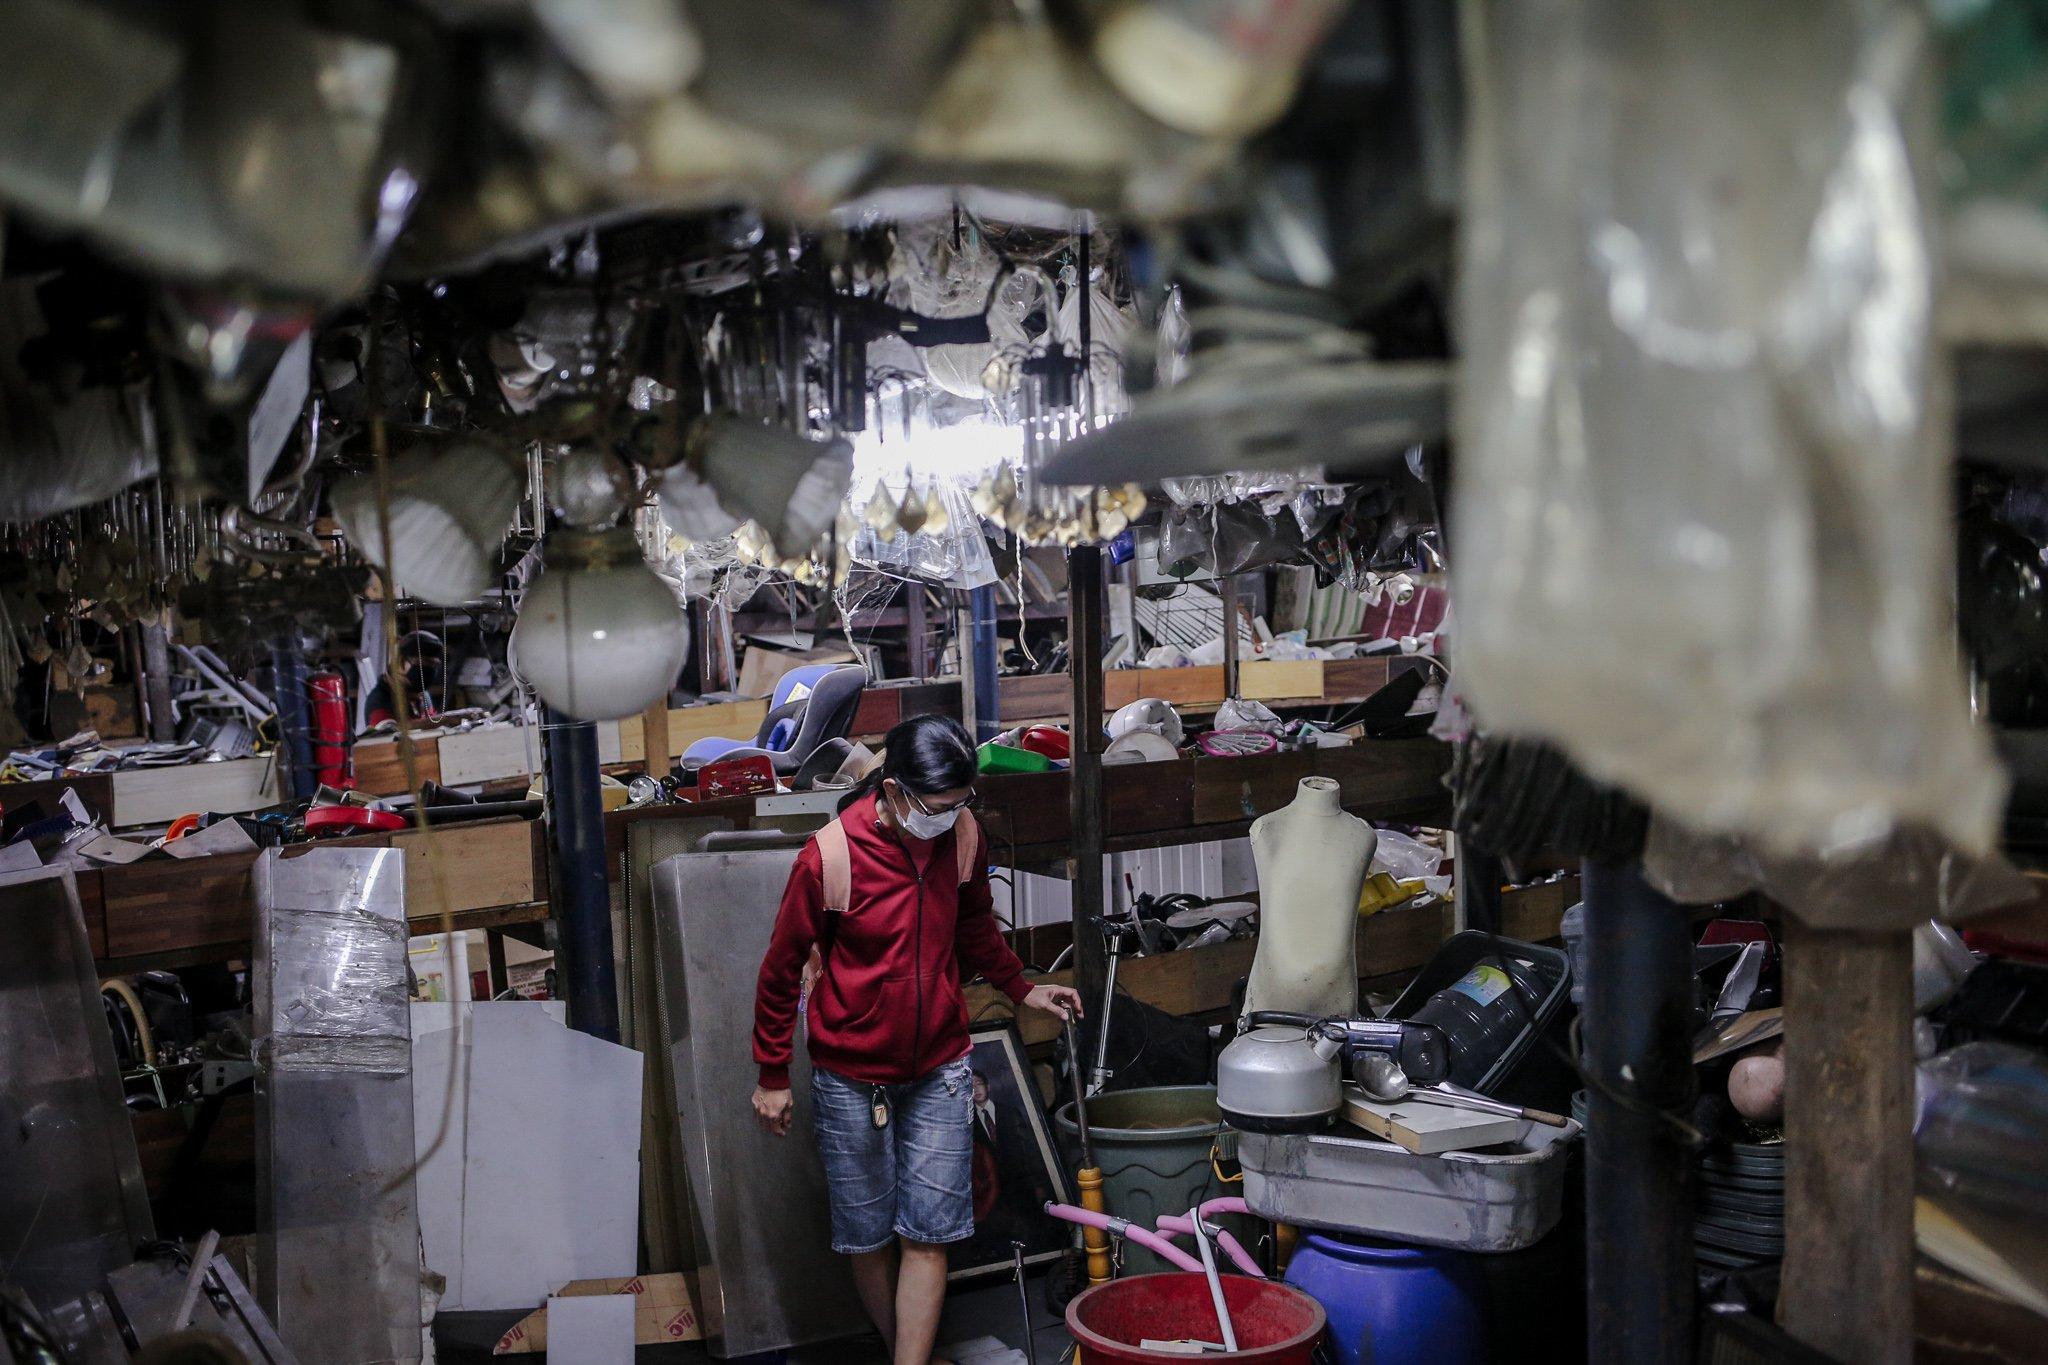 Pengunjung memilah barang bekas yang digantungkan di Mal Rongsok Beji, Depok, Jawa Barat, Jumat, (17/9/2021). Dinas Lingkungan Hidup (DLH) DKI Jakarta mencatat limbah eletronik pada periode Februari sampai dengan Oktober 2020 mencapai 22,6 ton atau sebanyak 22.683 kilogram.